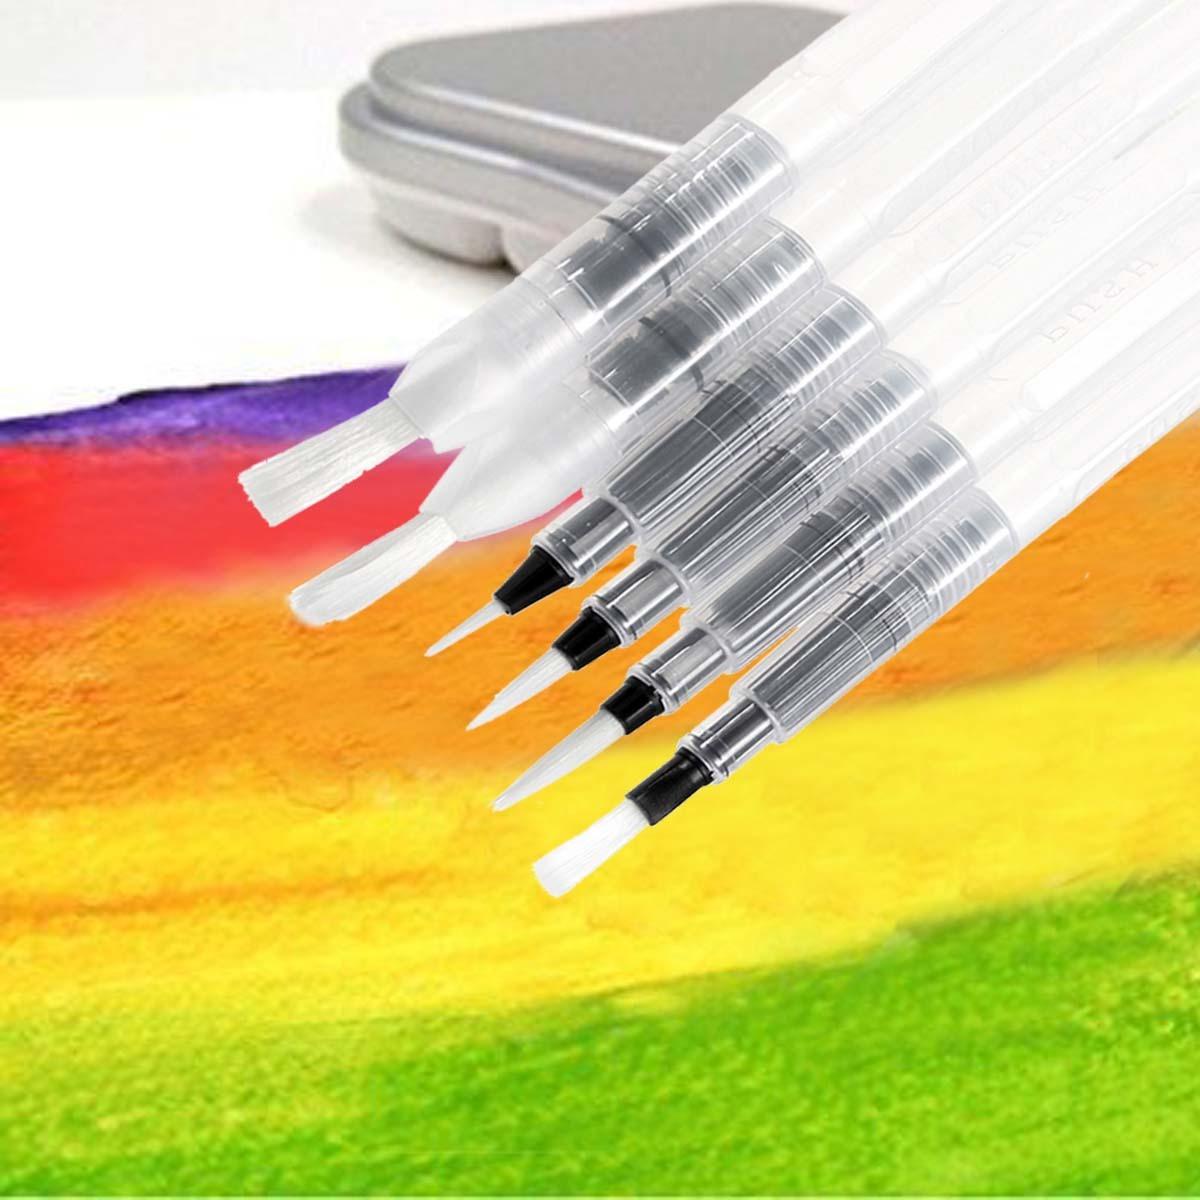 6X Recargable Color de agua suave Cepillo de Pintura Marcador Acuarela Dibujo Bolígrafo LS